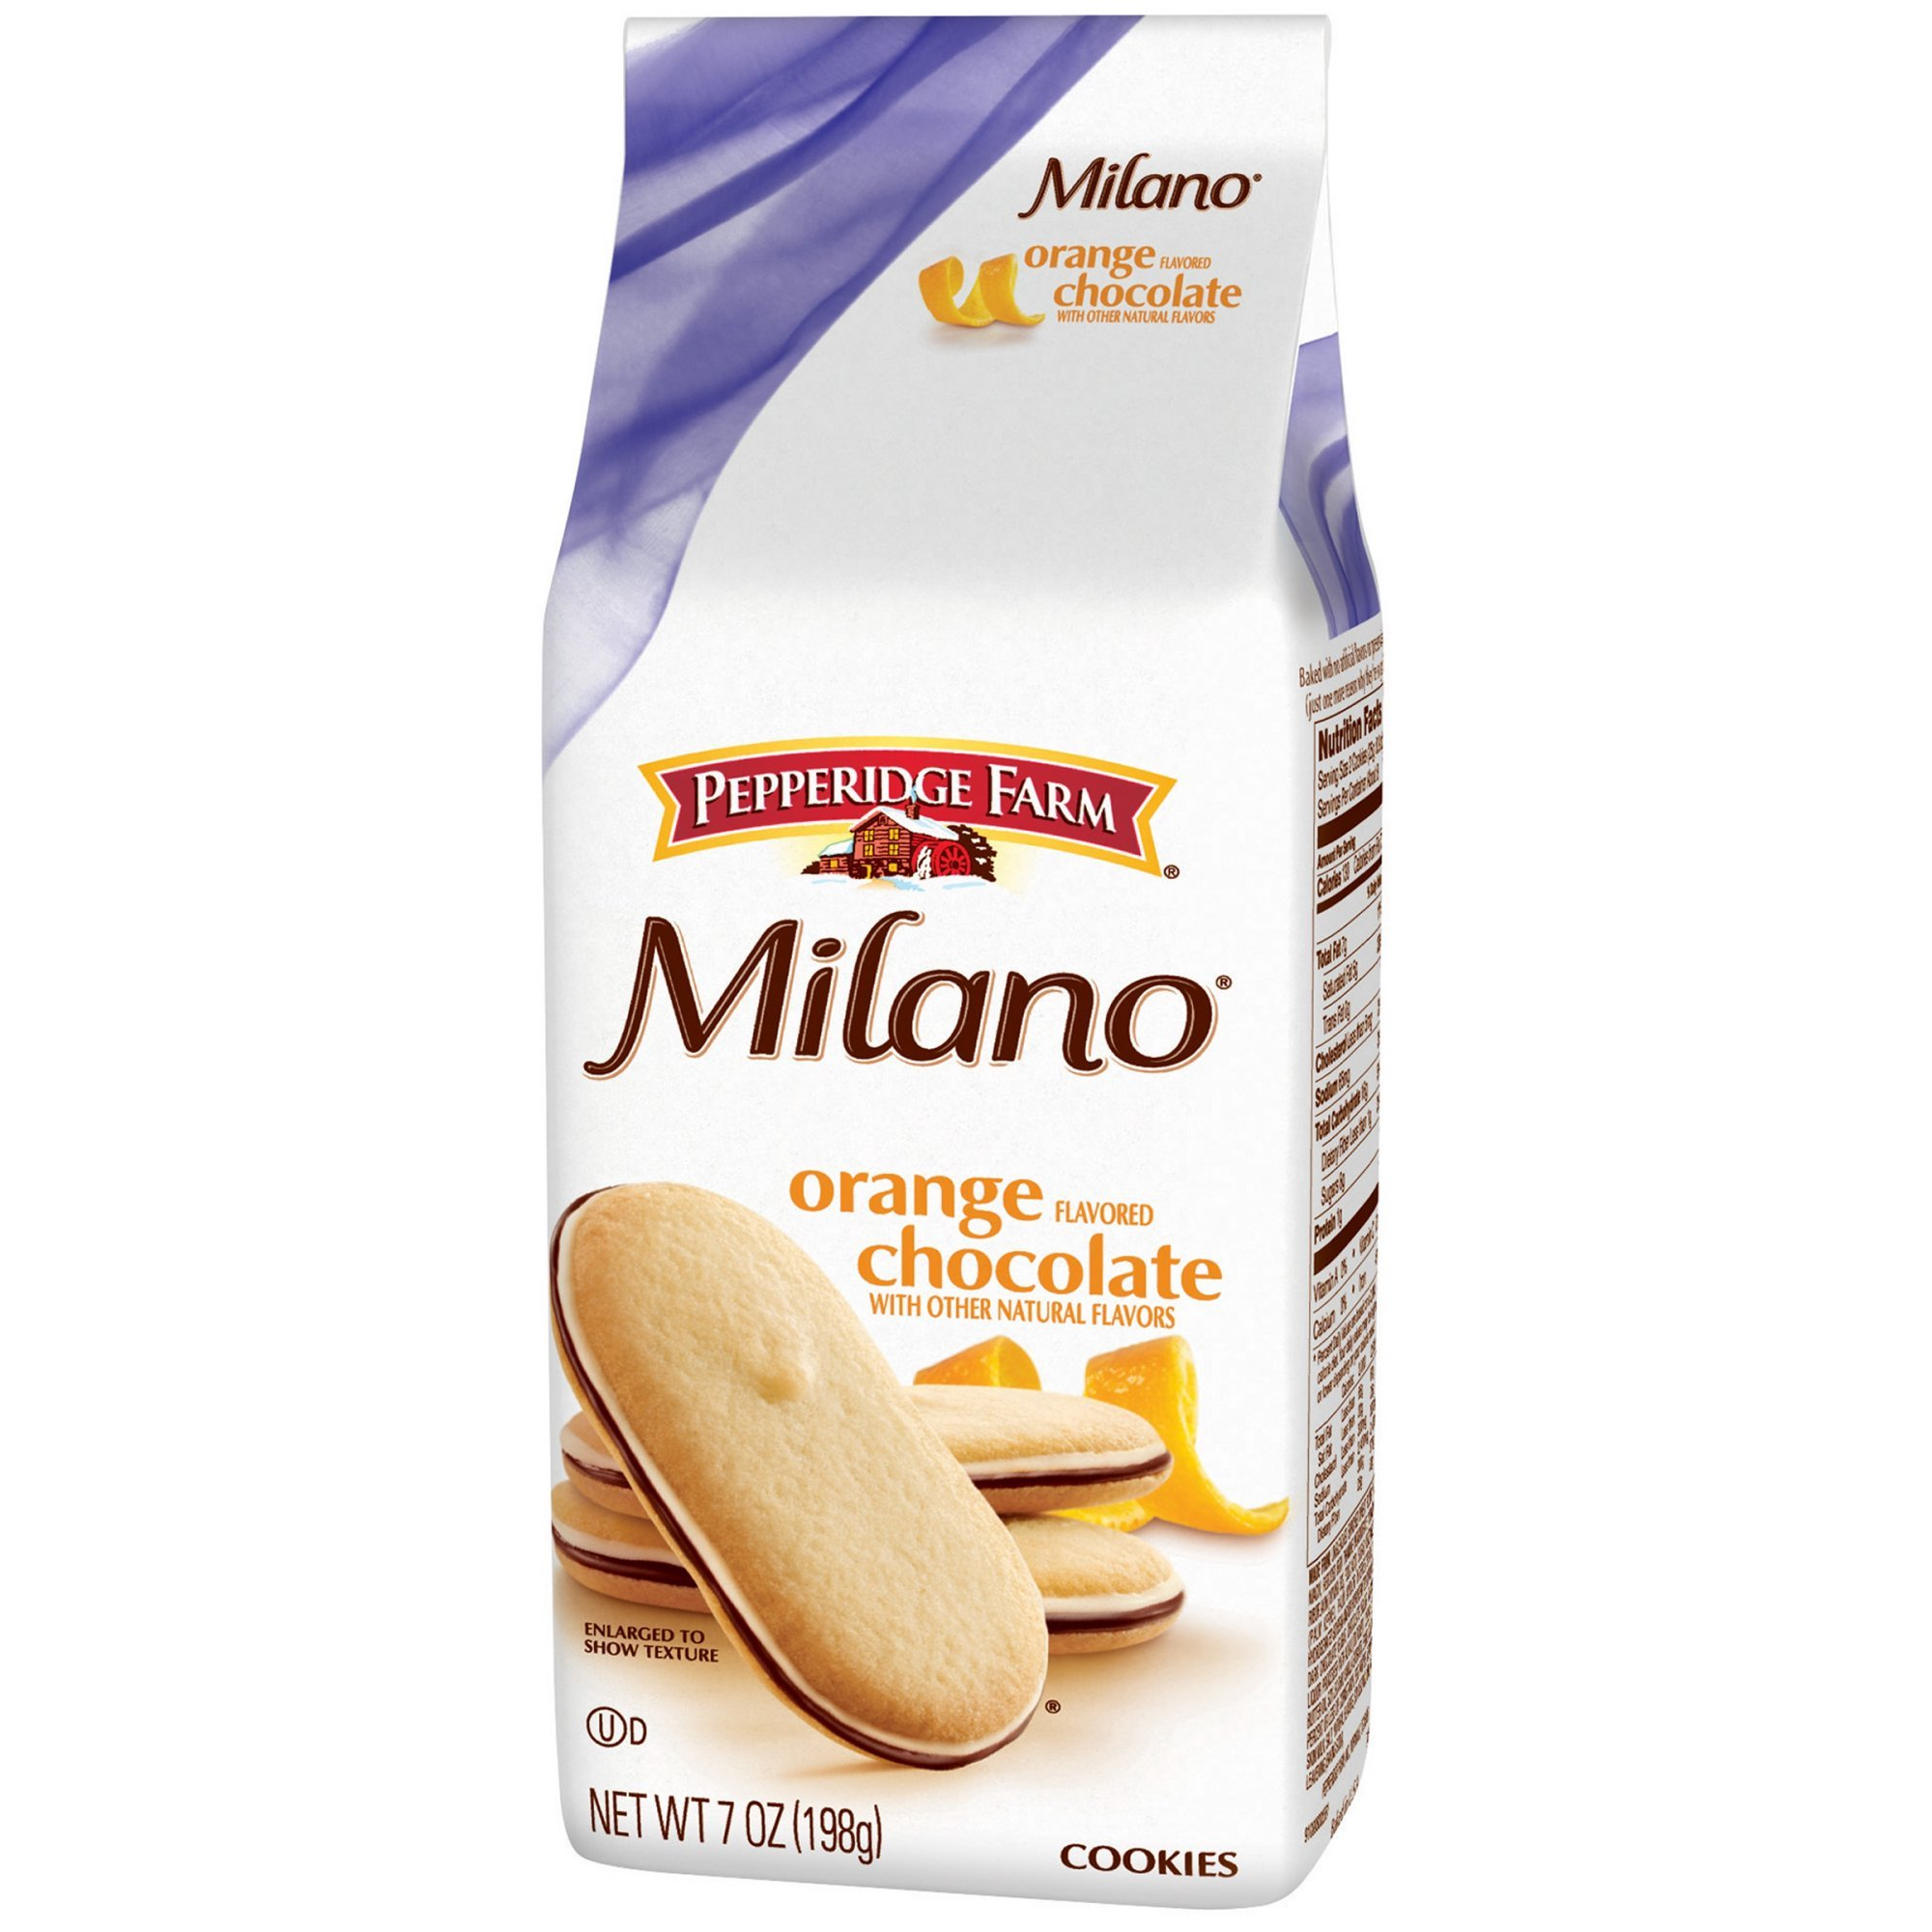 Pepperidge Farm Milano Orange Flavored Chocolate Cookies 7 oz (Pack of 5) by Pepperidge Farm